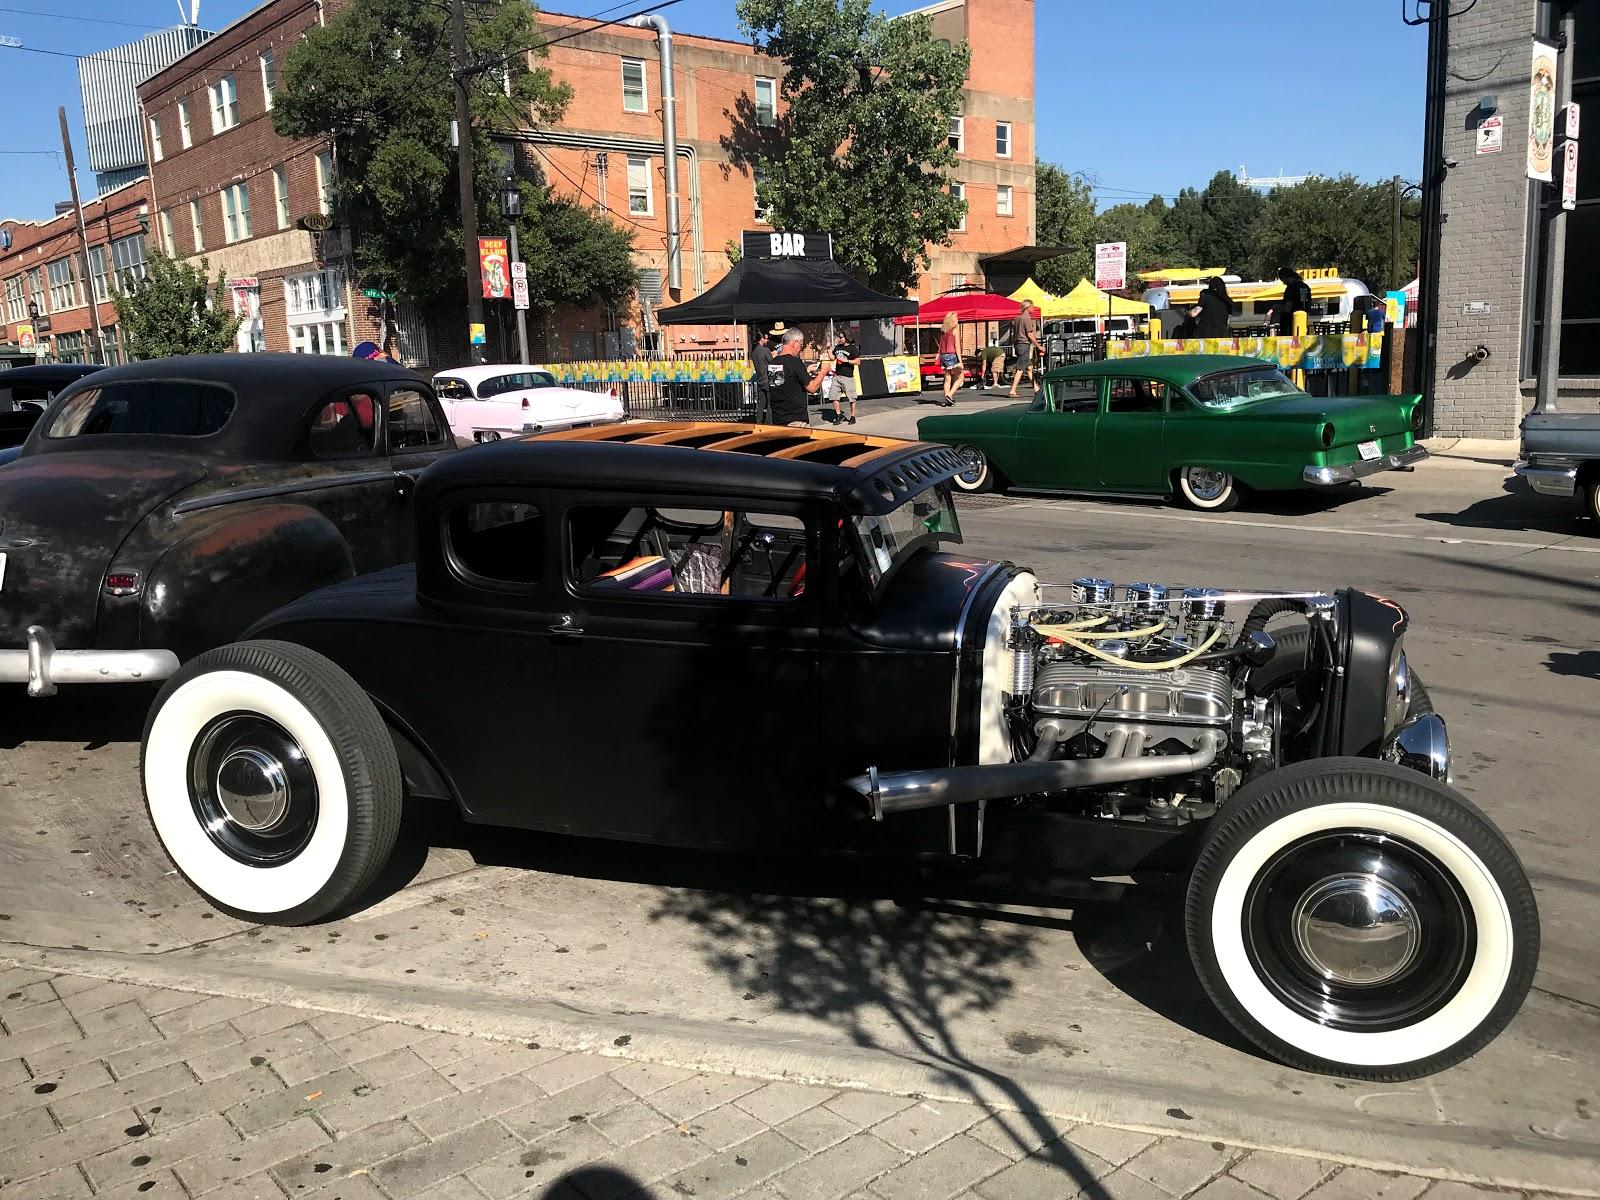 Image: Old school car seen at The Invasion Car Show Deep Ellum Dallas Texas